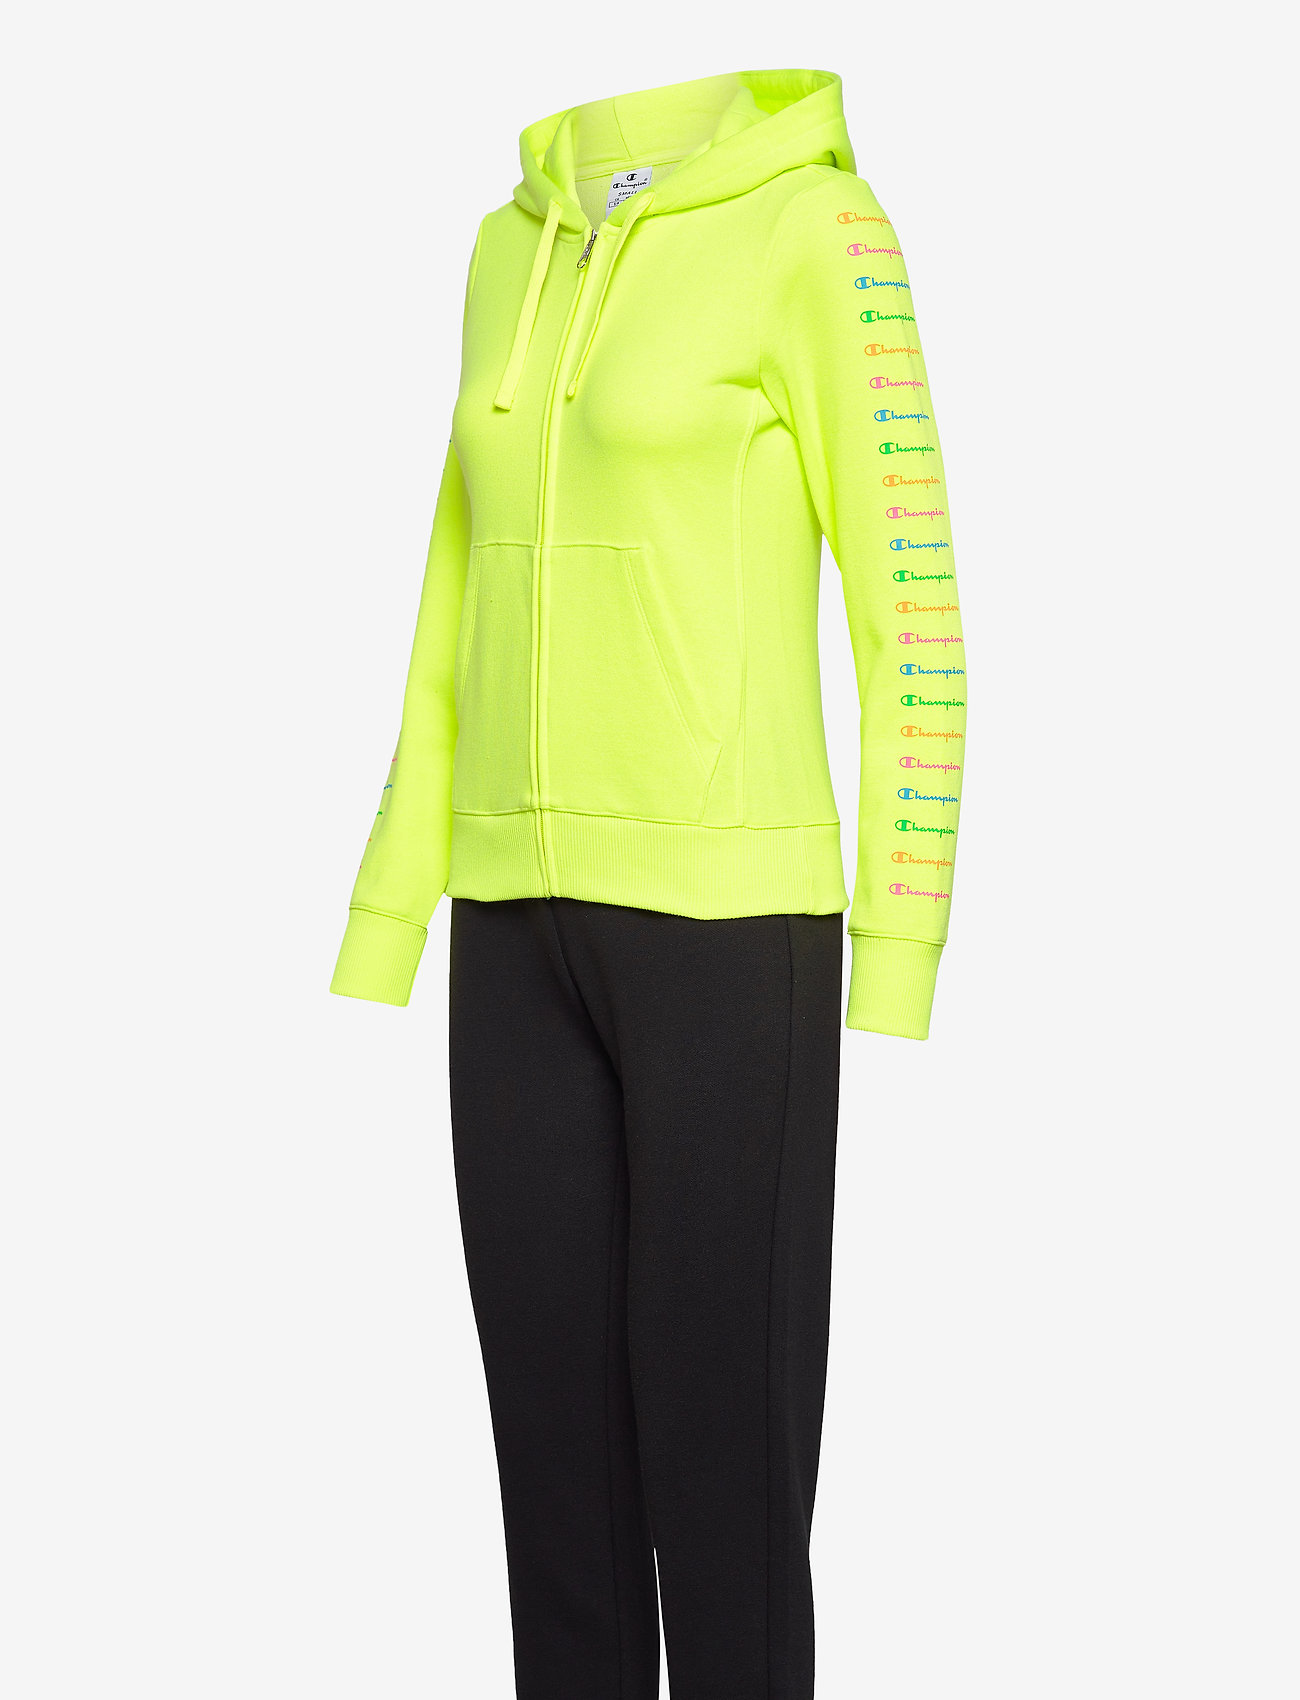 Sweatsuit (Safety Yellow Fluo Tp (syff)) (42.50 €) - Champion ASJ5H